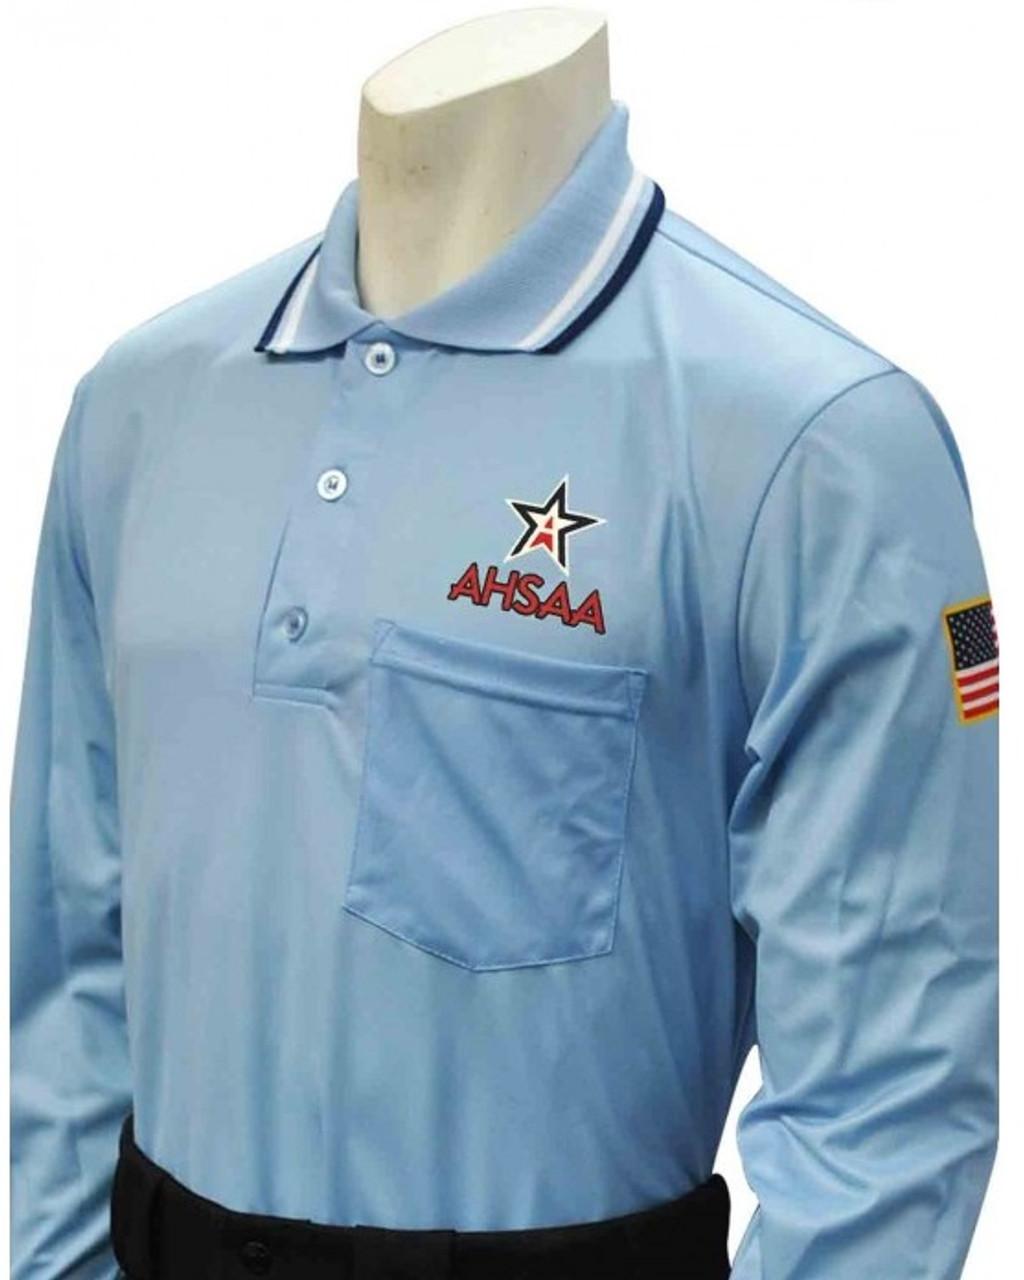 Alabama AHSAA Dye Sublimated Long Sleeve Powder Umpire Shirt